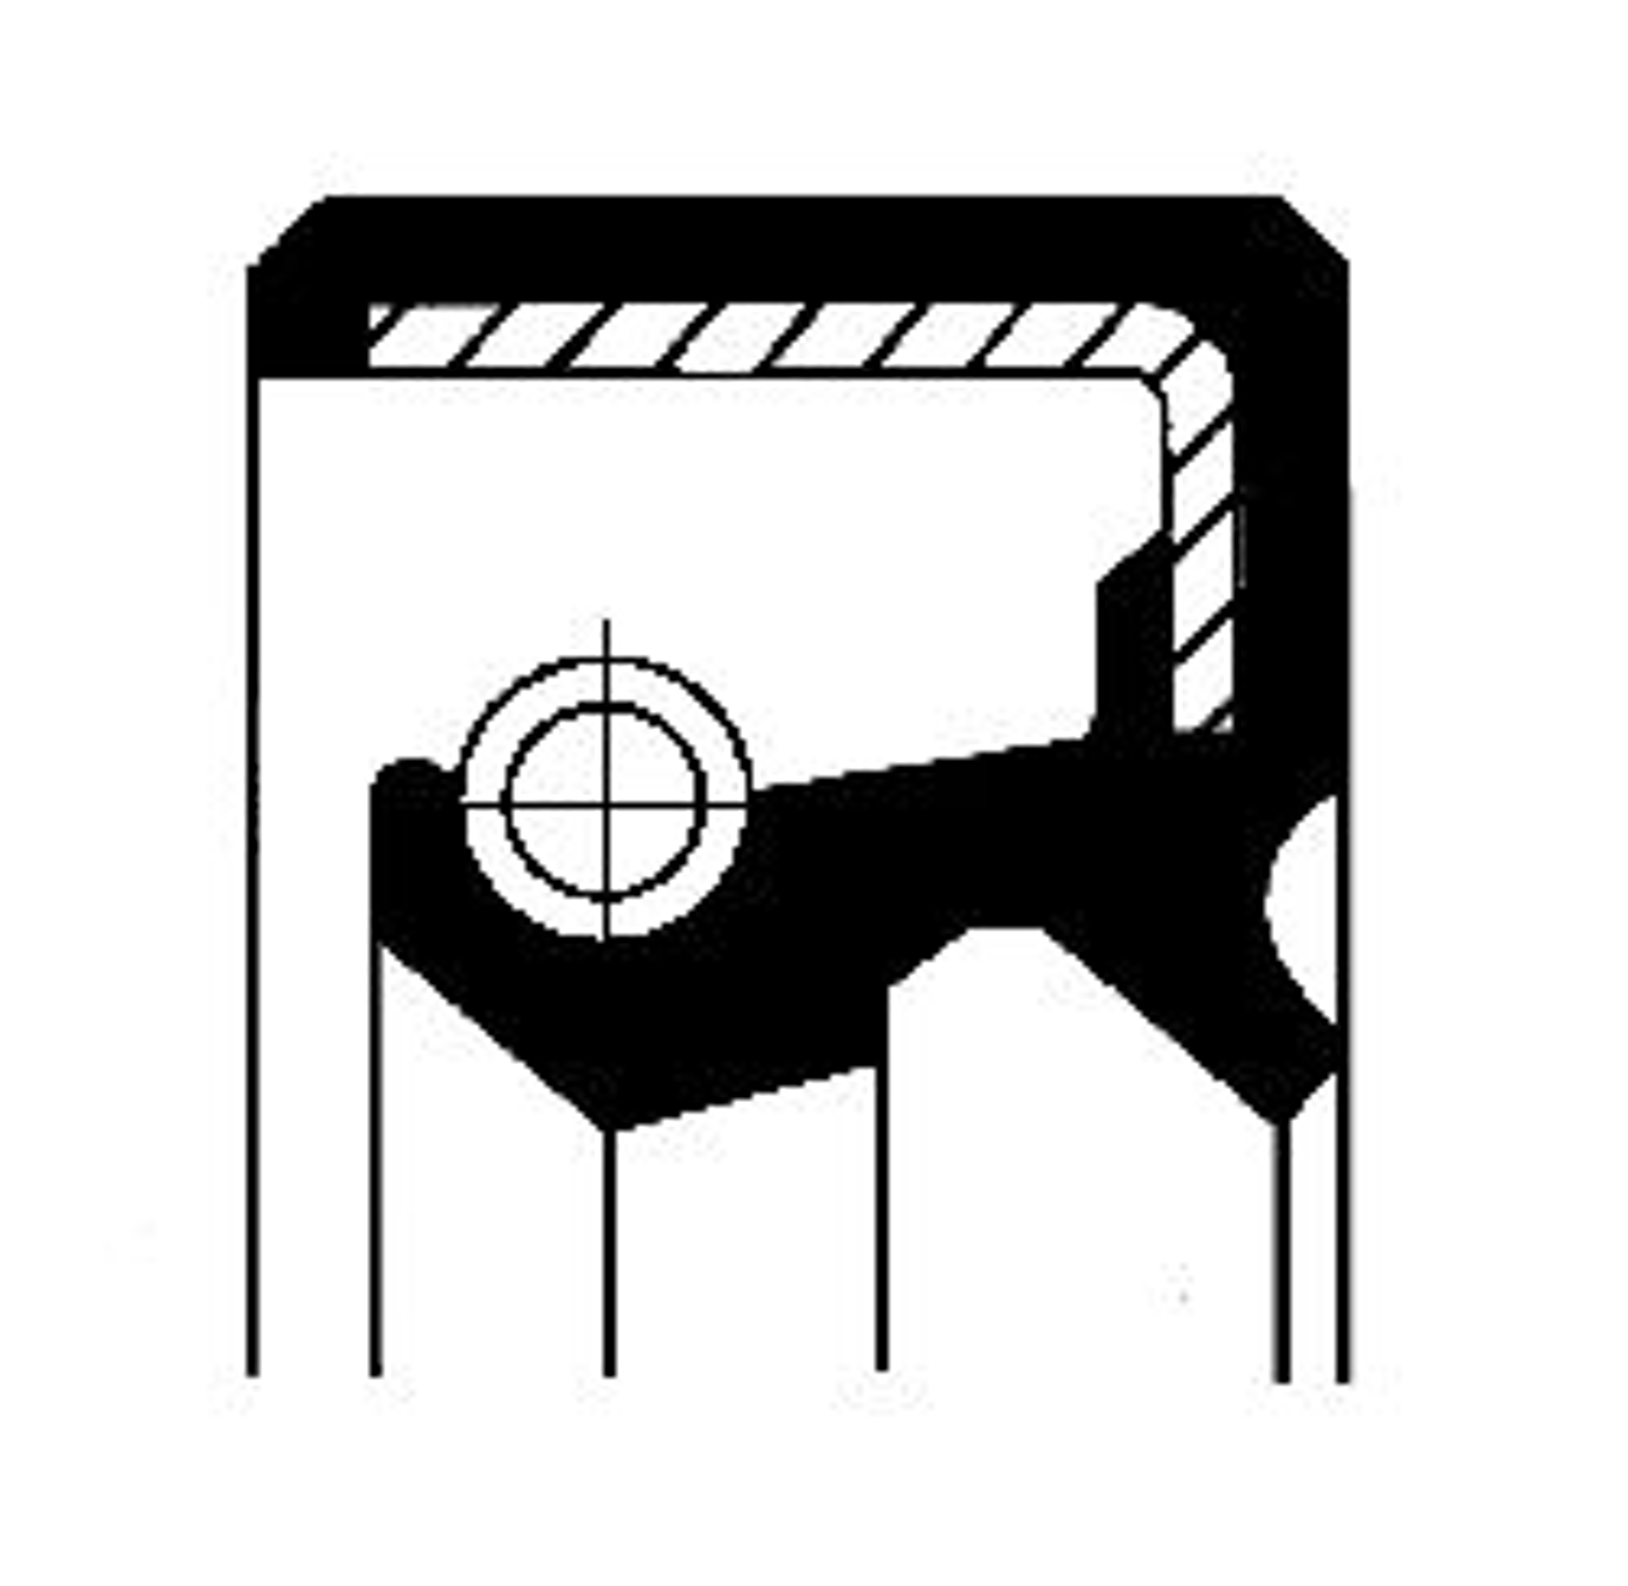 OPEL ASTRA 2015 Wellendichtring, Schaltgetriebe - Original CORTECO 19027868B